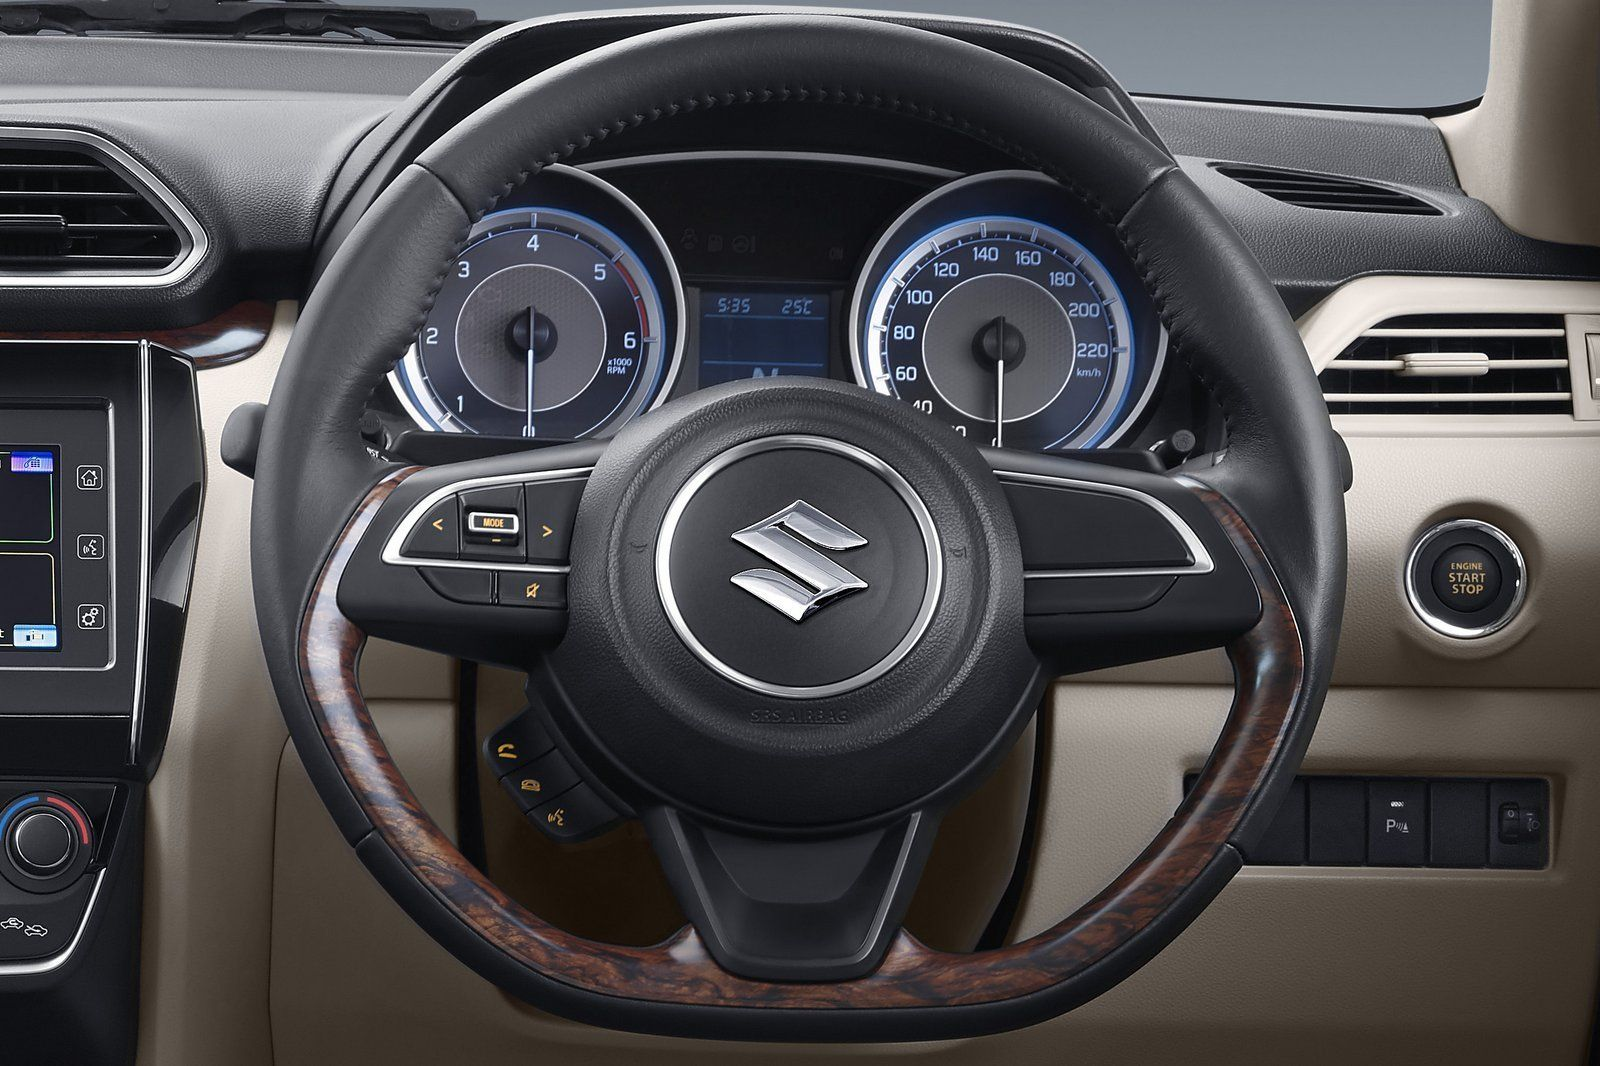 2018 maruti suzuki dzire is india 39 s swift sedan carscoops. Black Bedroom Furniture Sets. Home Design Ideas